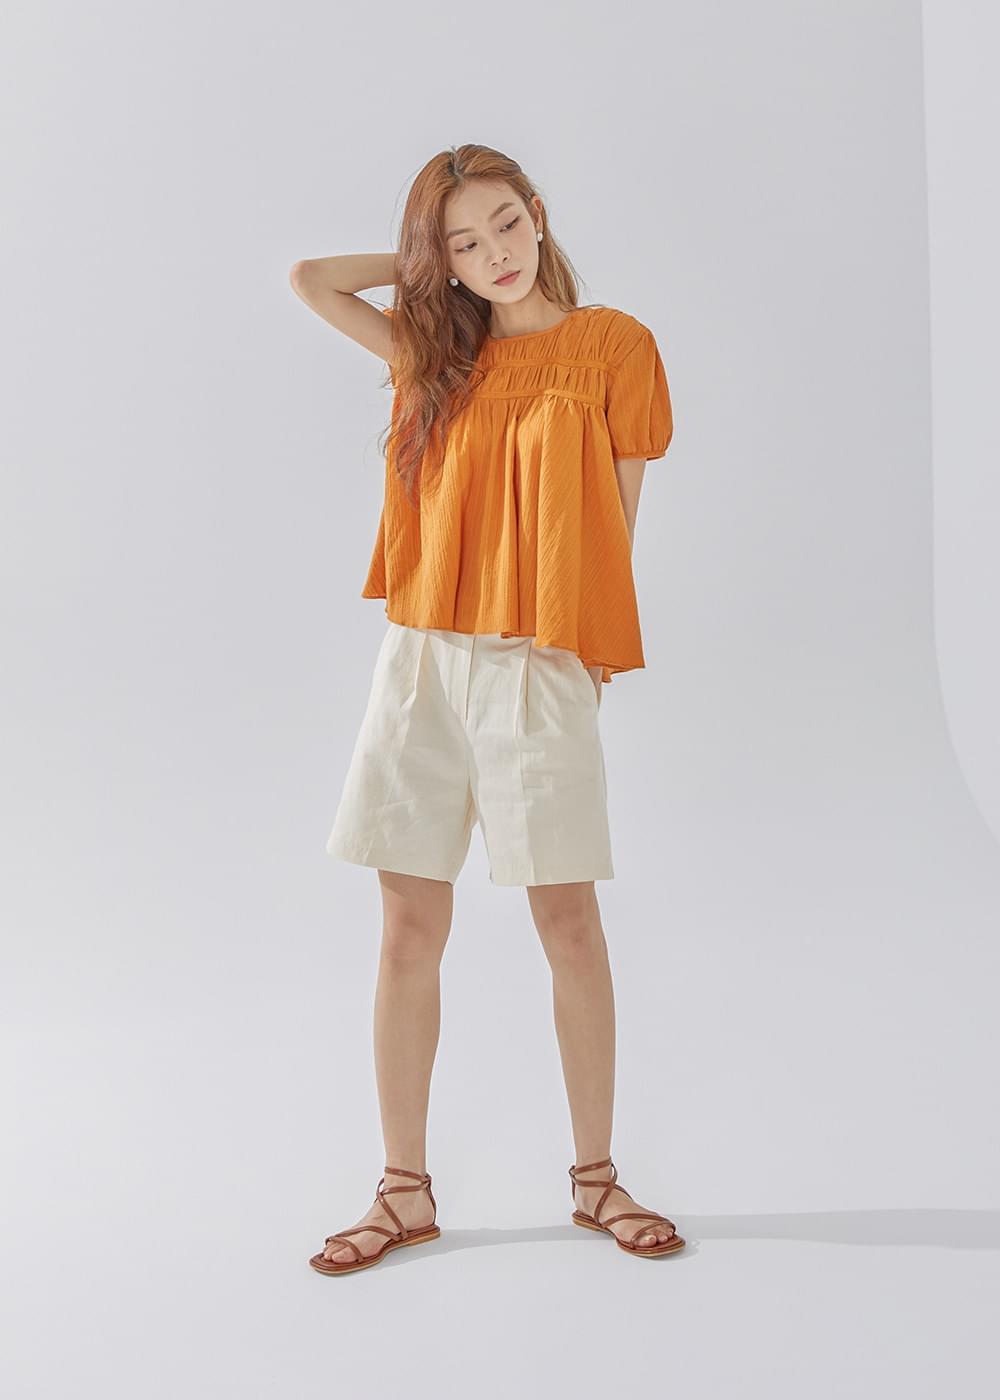 Jurmy blouse